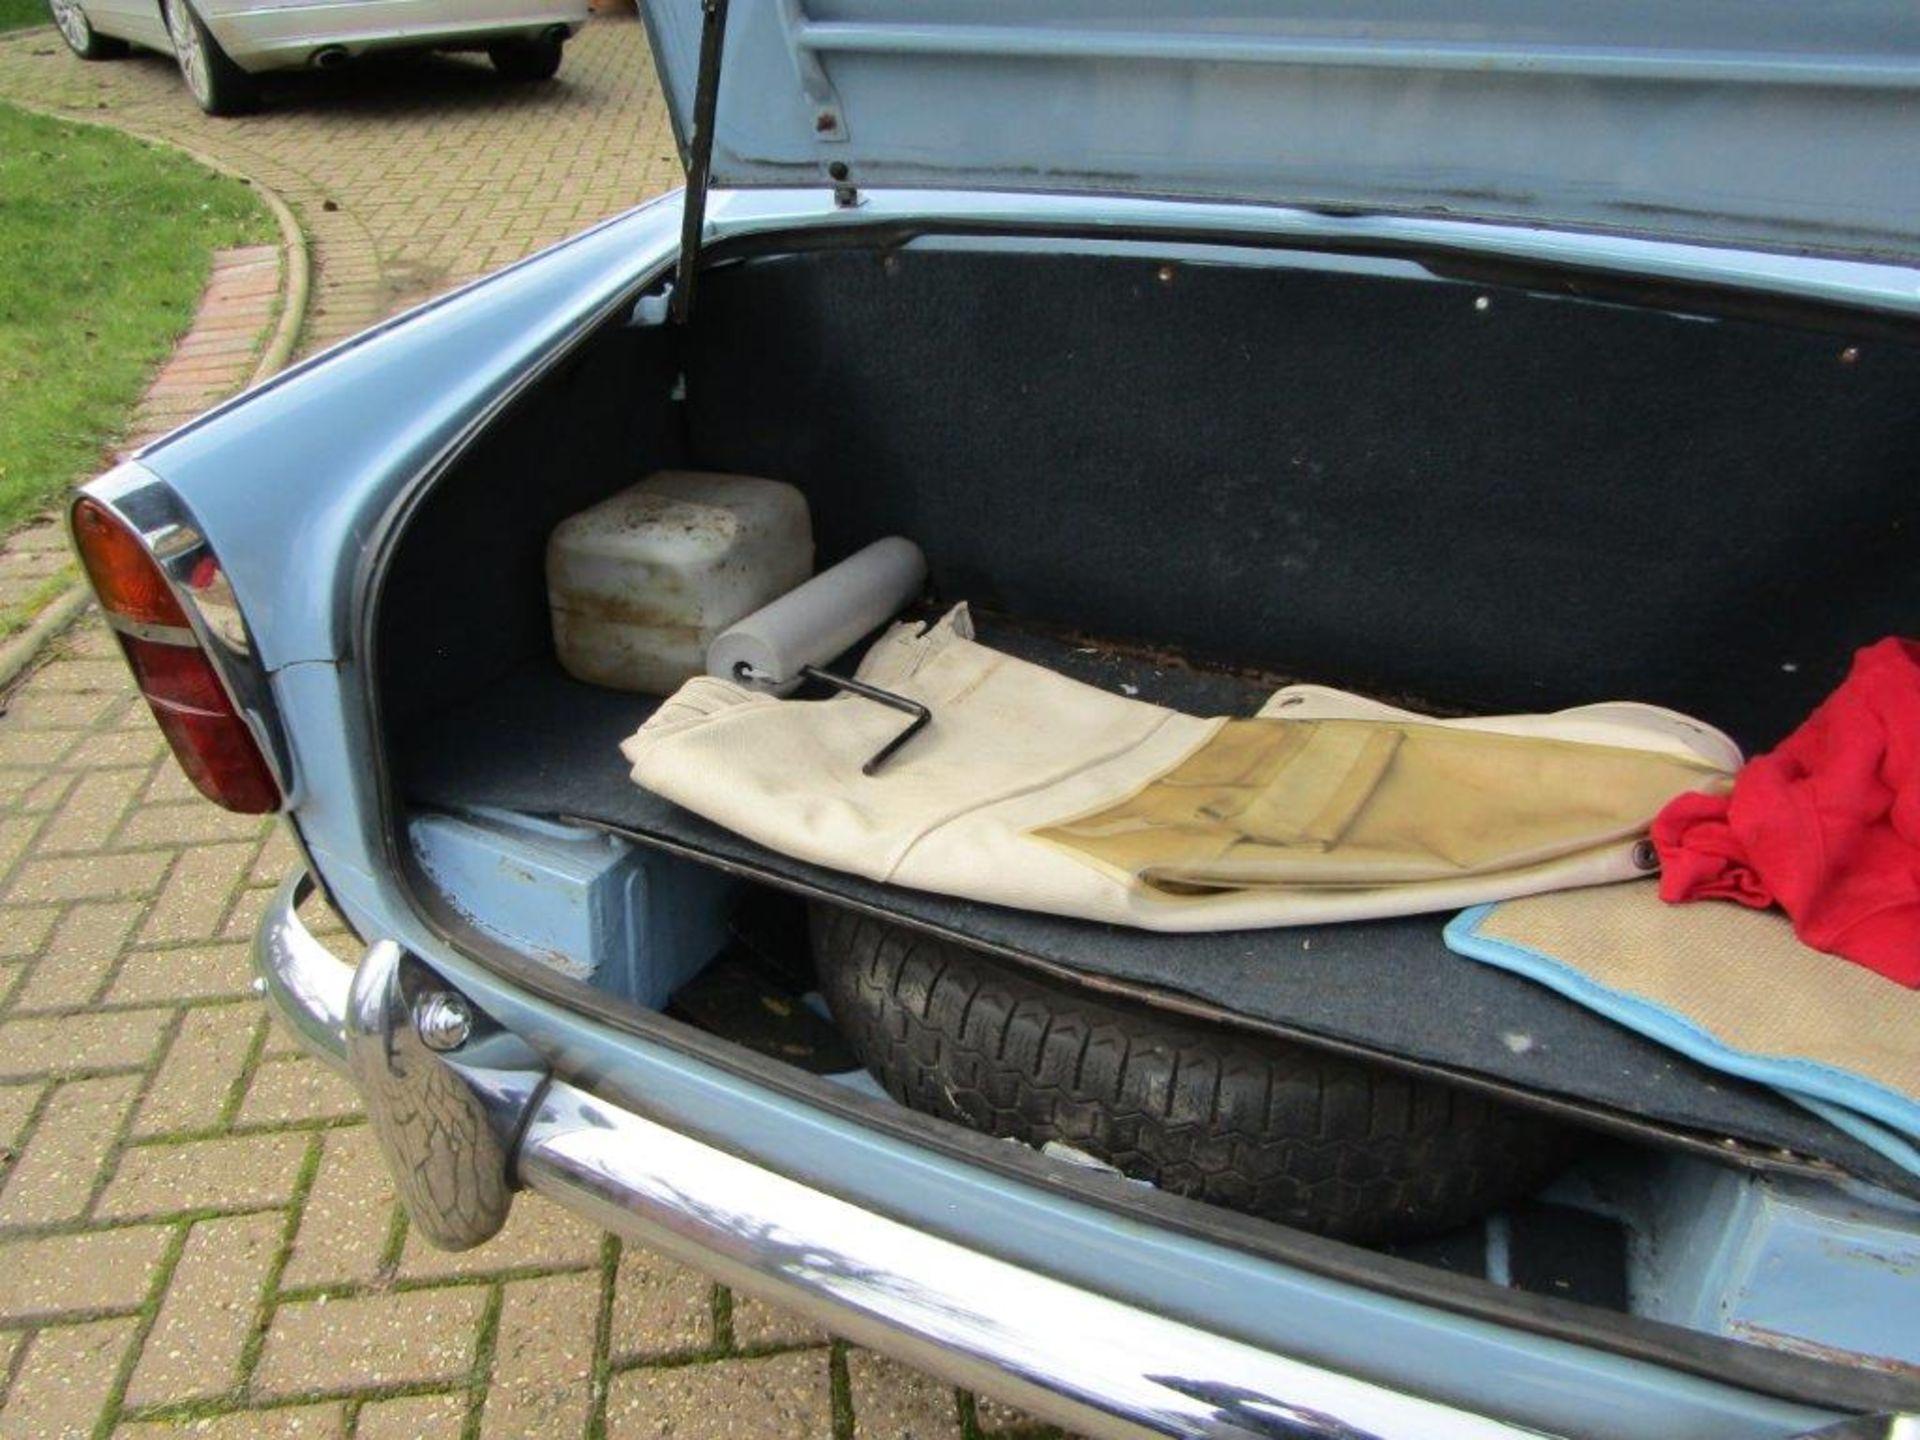 1965 Triumph TR4 - Image 13 of 17